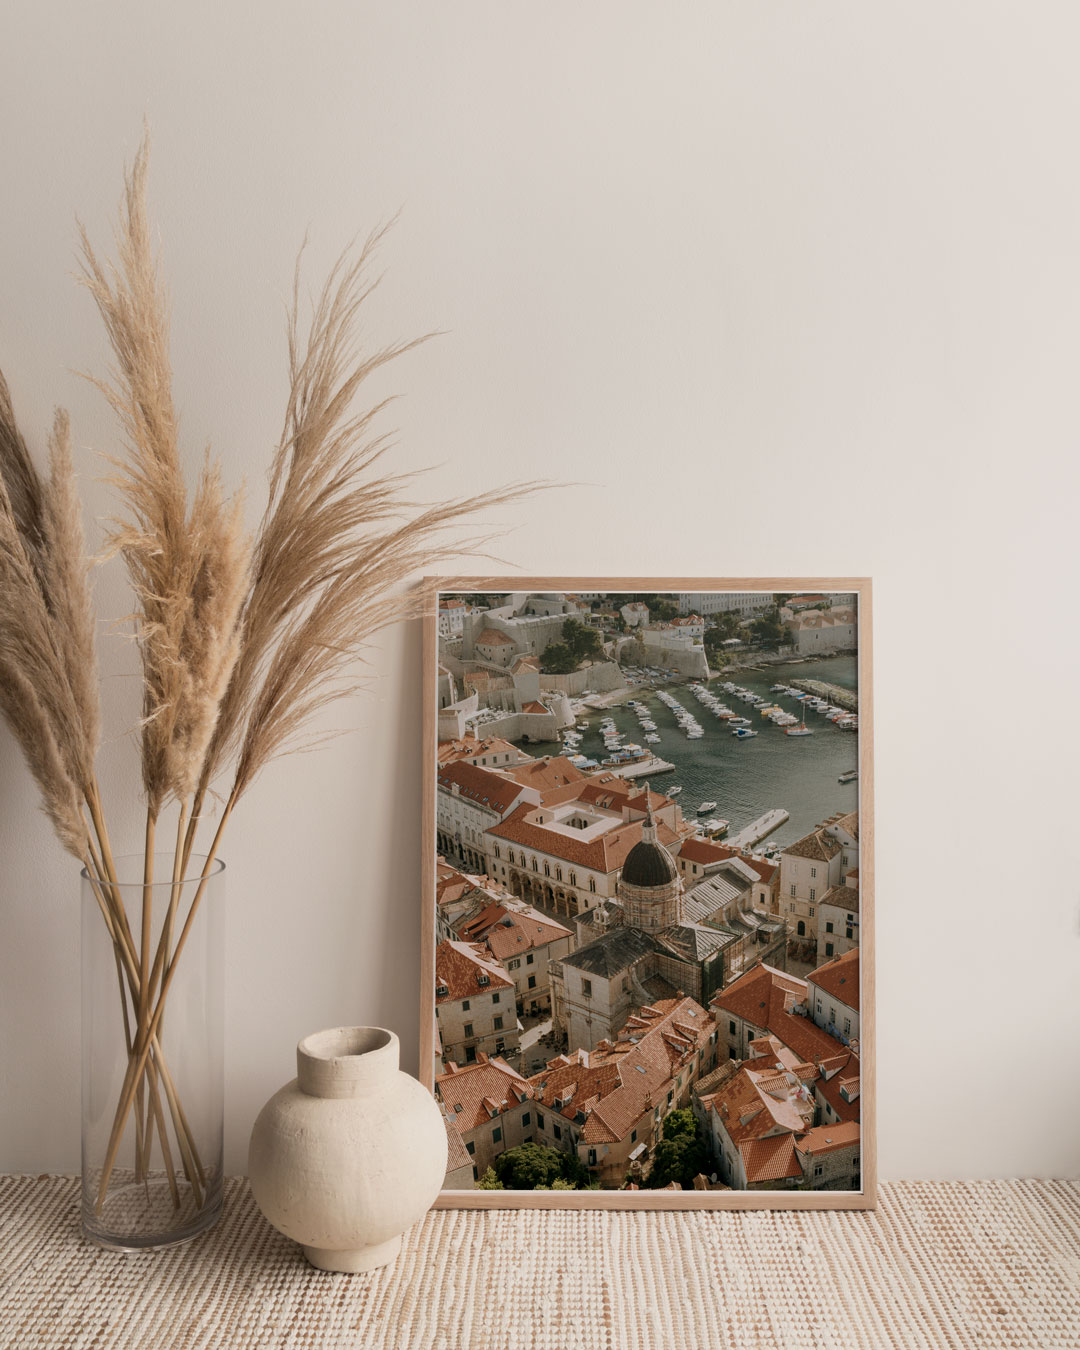 A framed print by Aleksandar Jason as part of July Travel Editions.